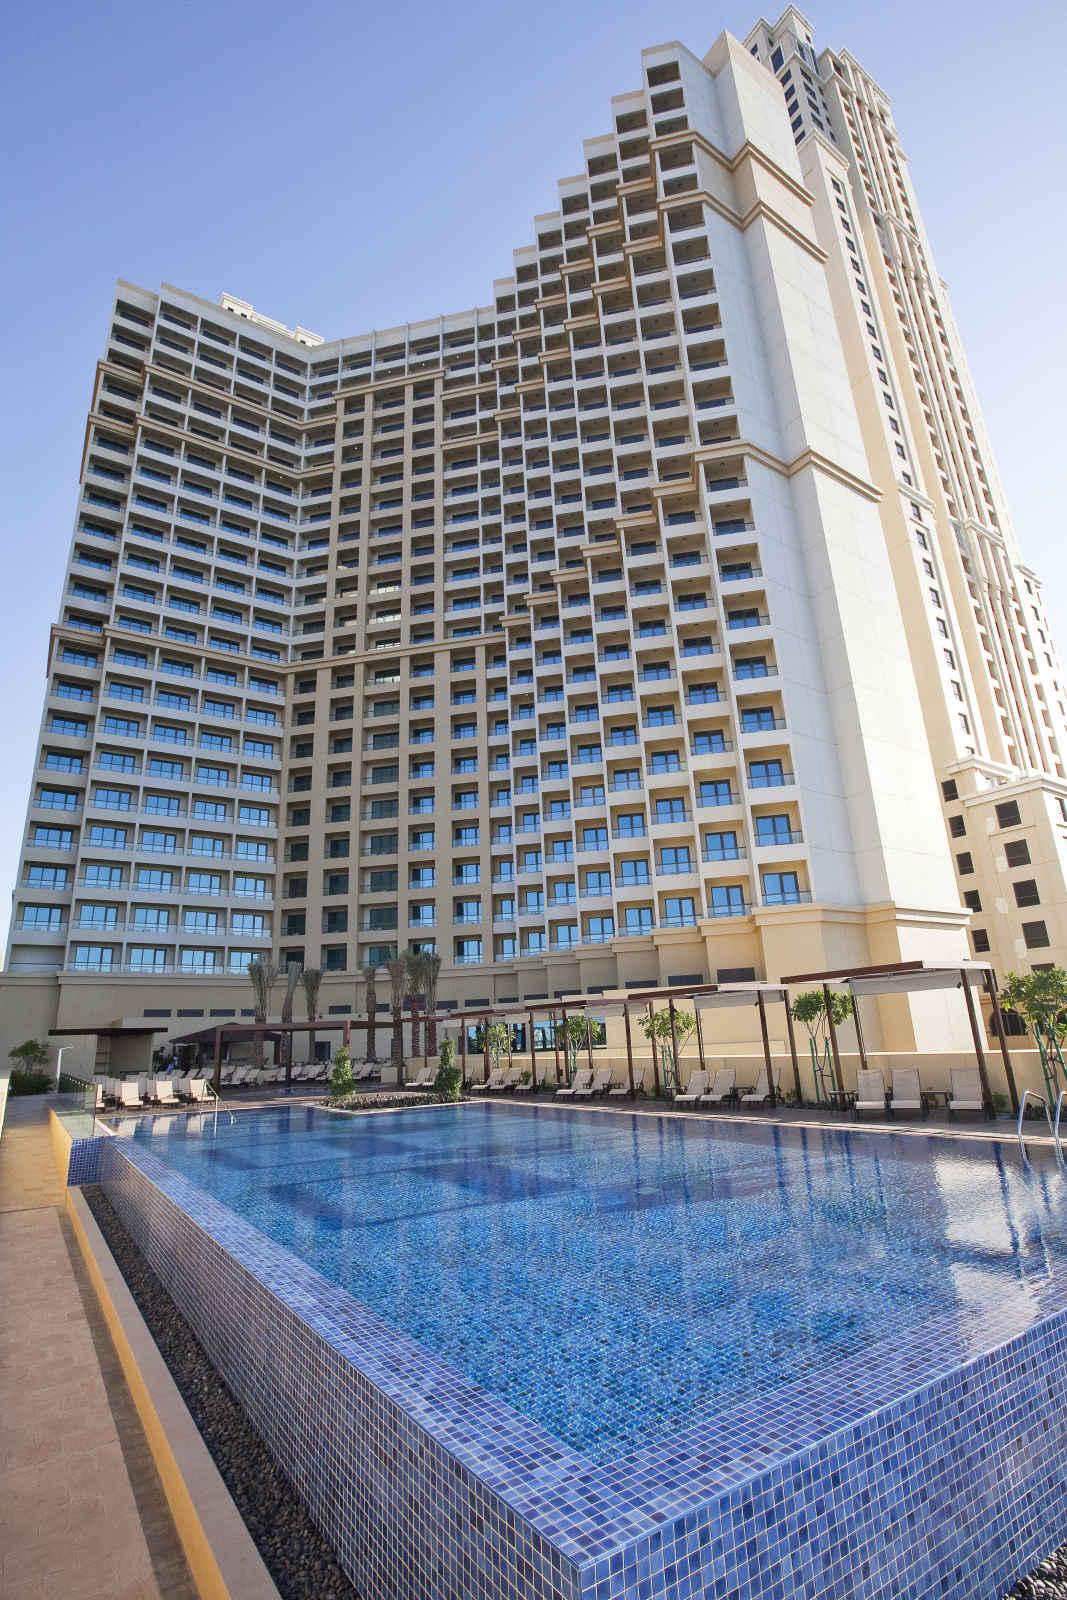 Emirats Arabes Unis - Dubaï - Hôtel Ja Ocean View Hotel 4*